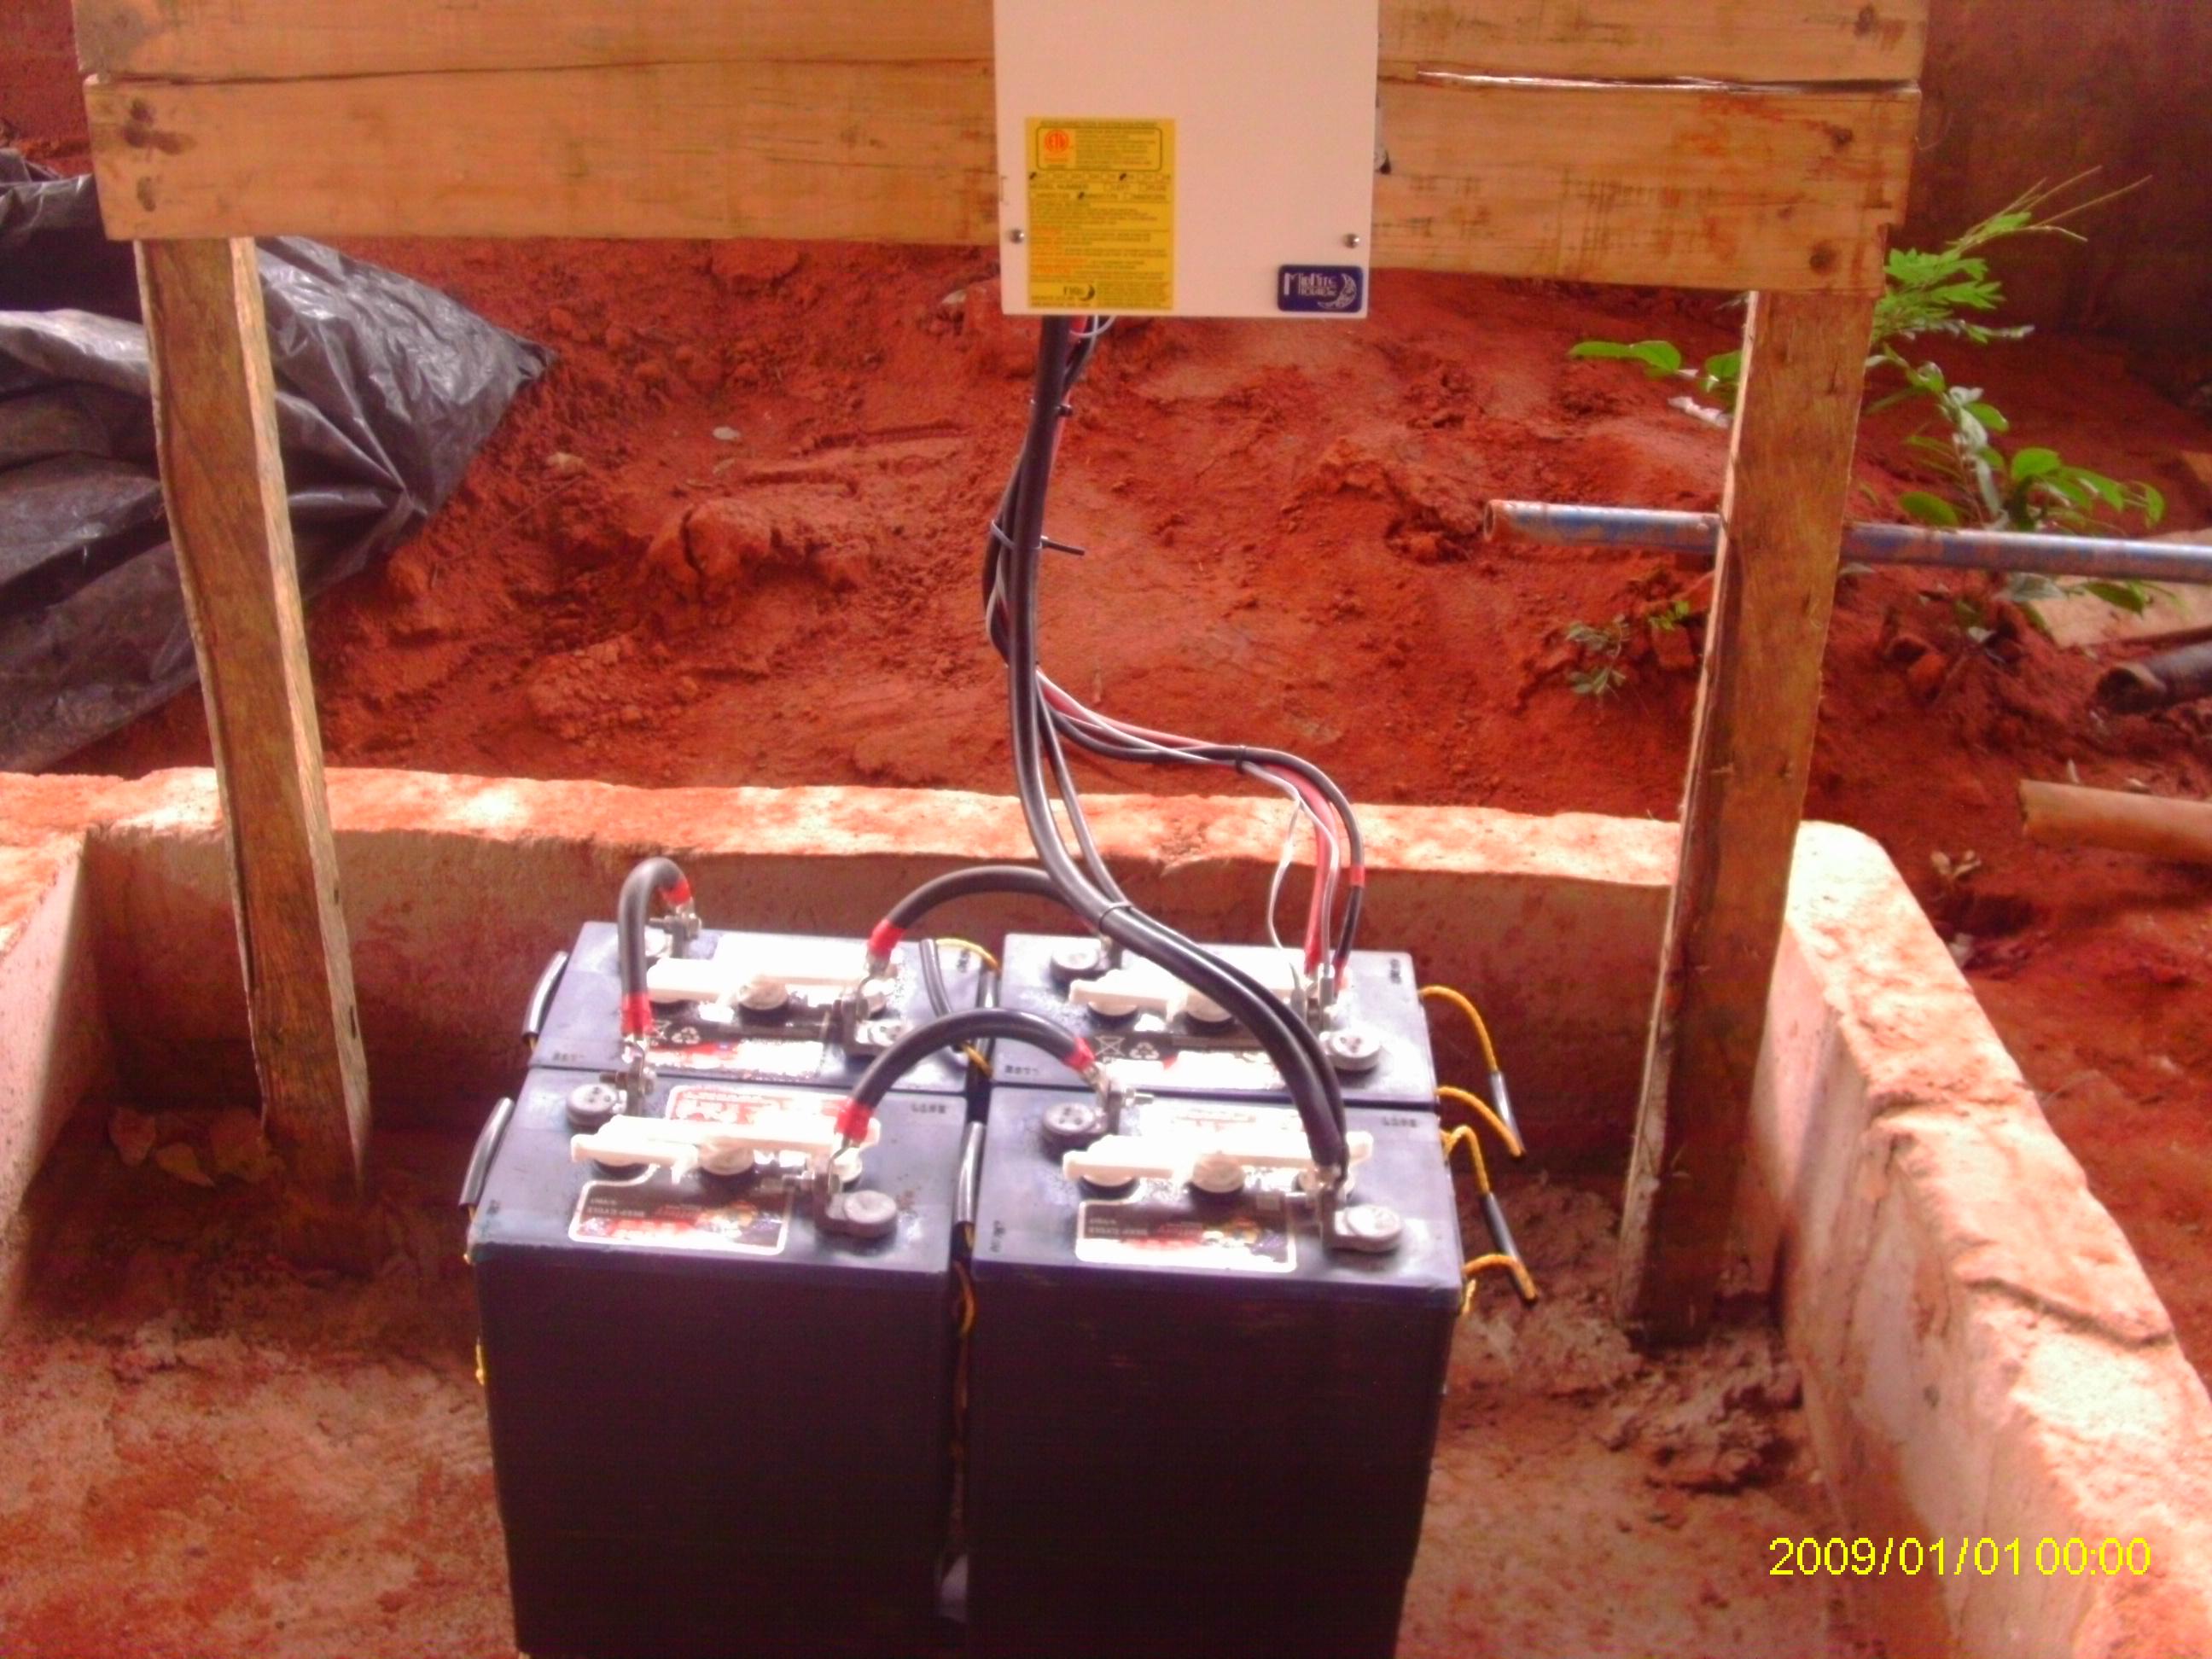 L16 battery awps renewable energy